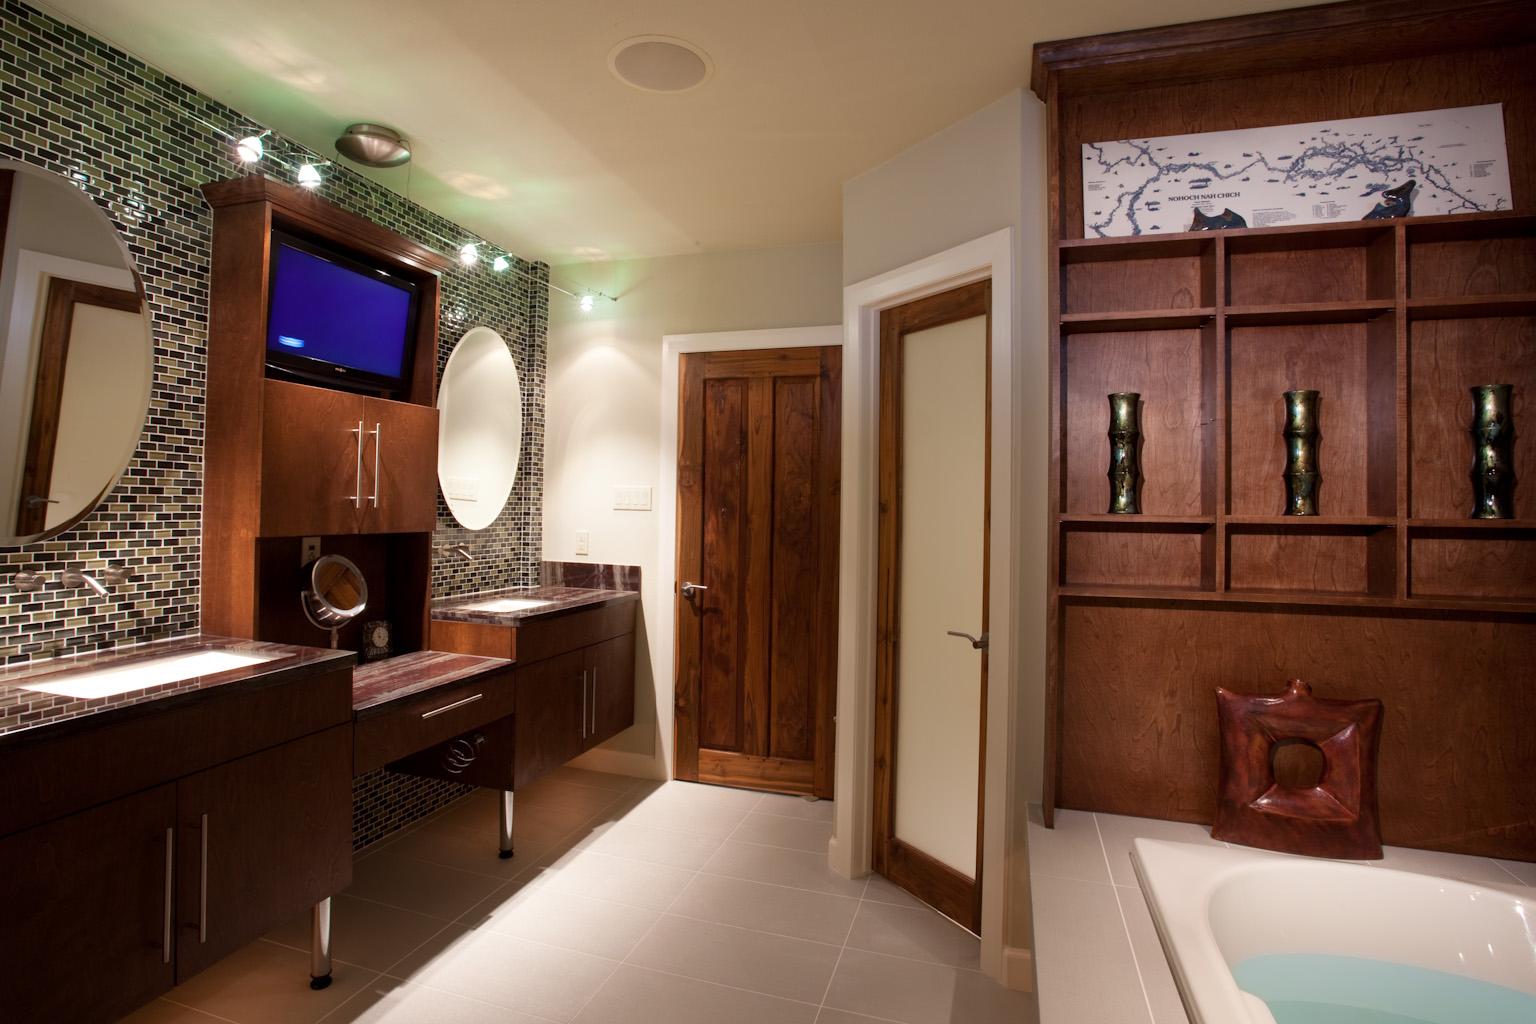 Master Bathroom Remodel Ideas Obsidiansmaze